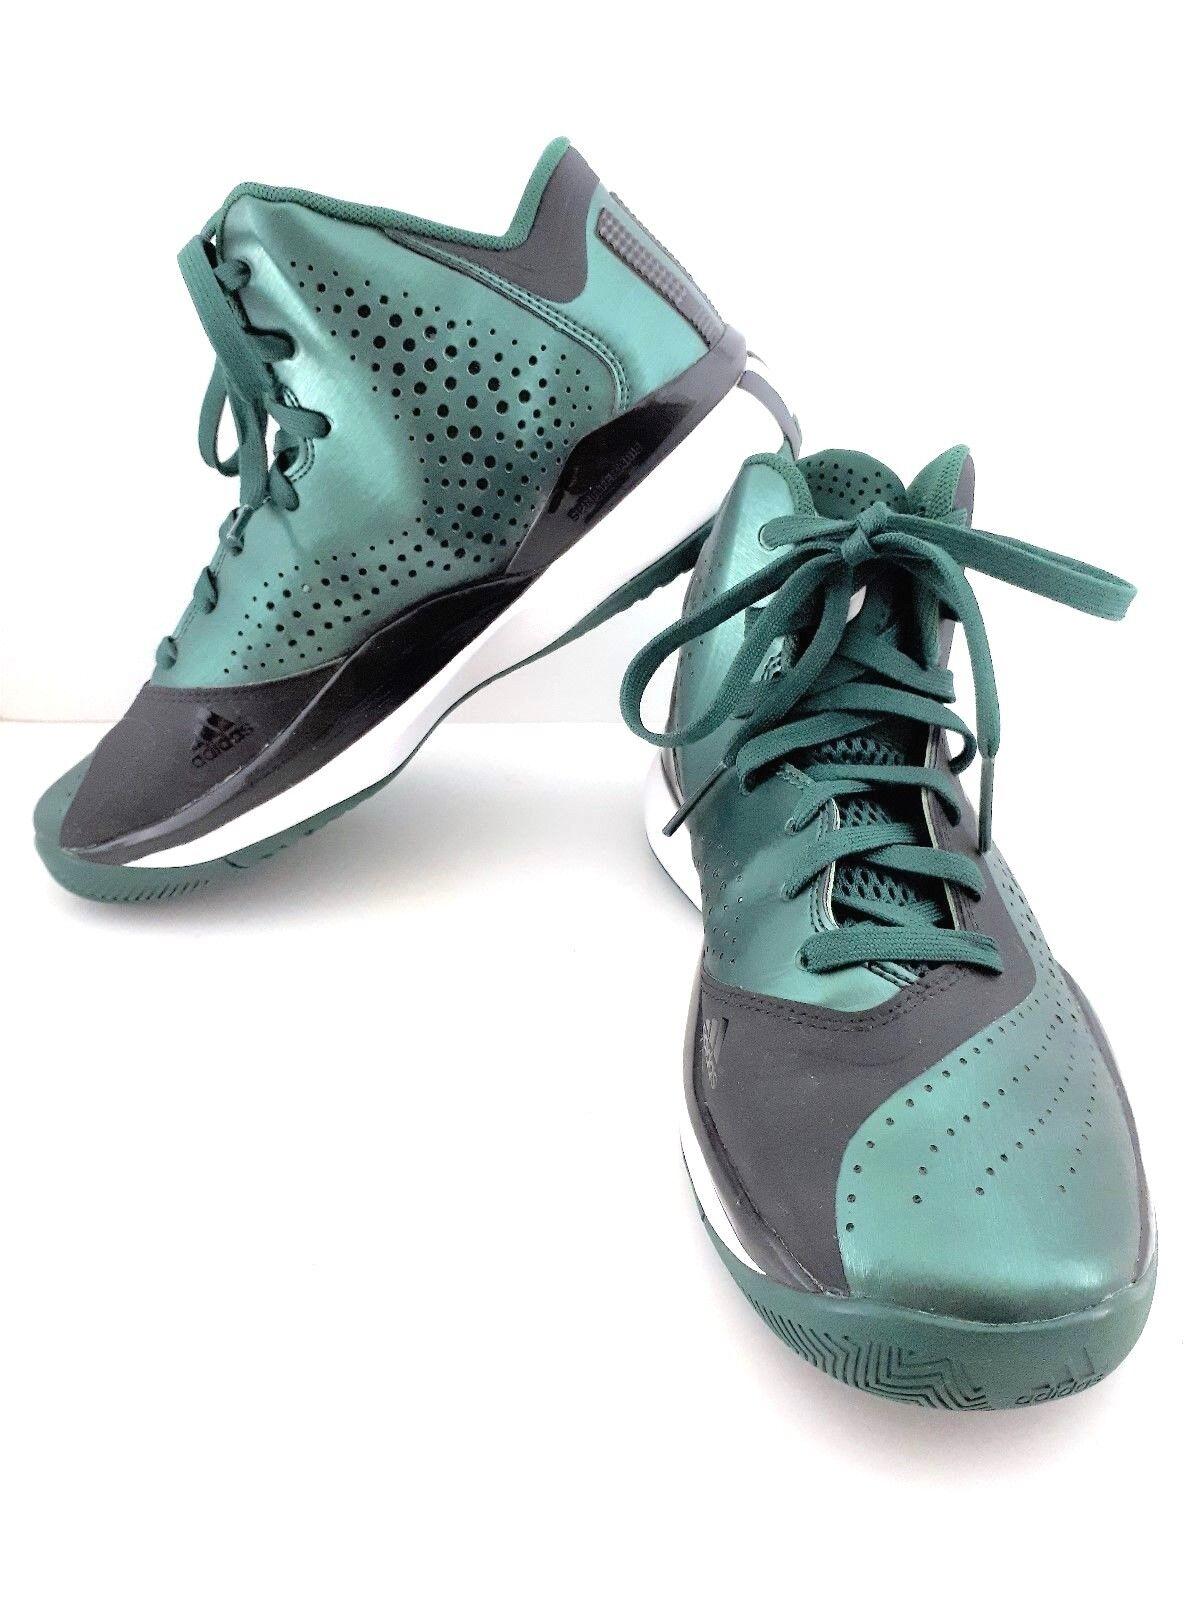 DRose Derrick Rose 773 III Adidas Sprint Web Green / Black Size 5.5 NWOT